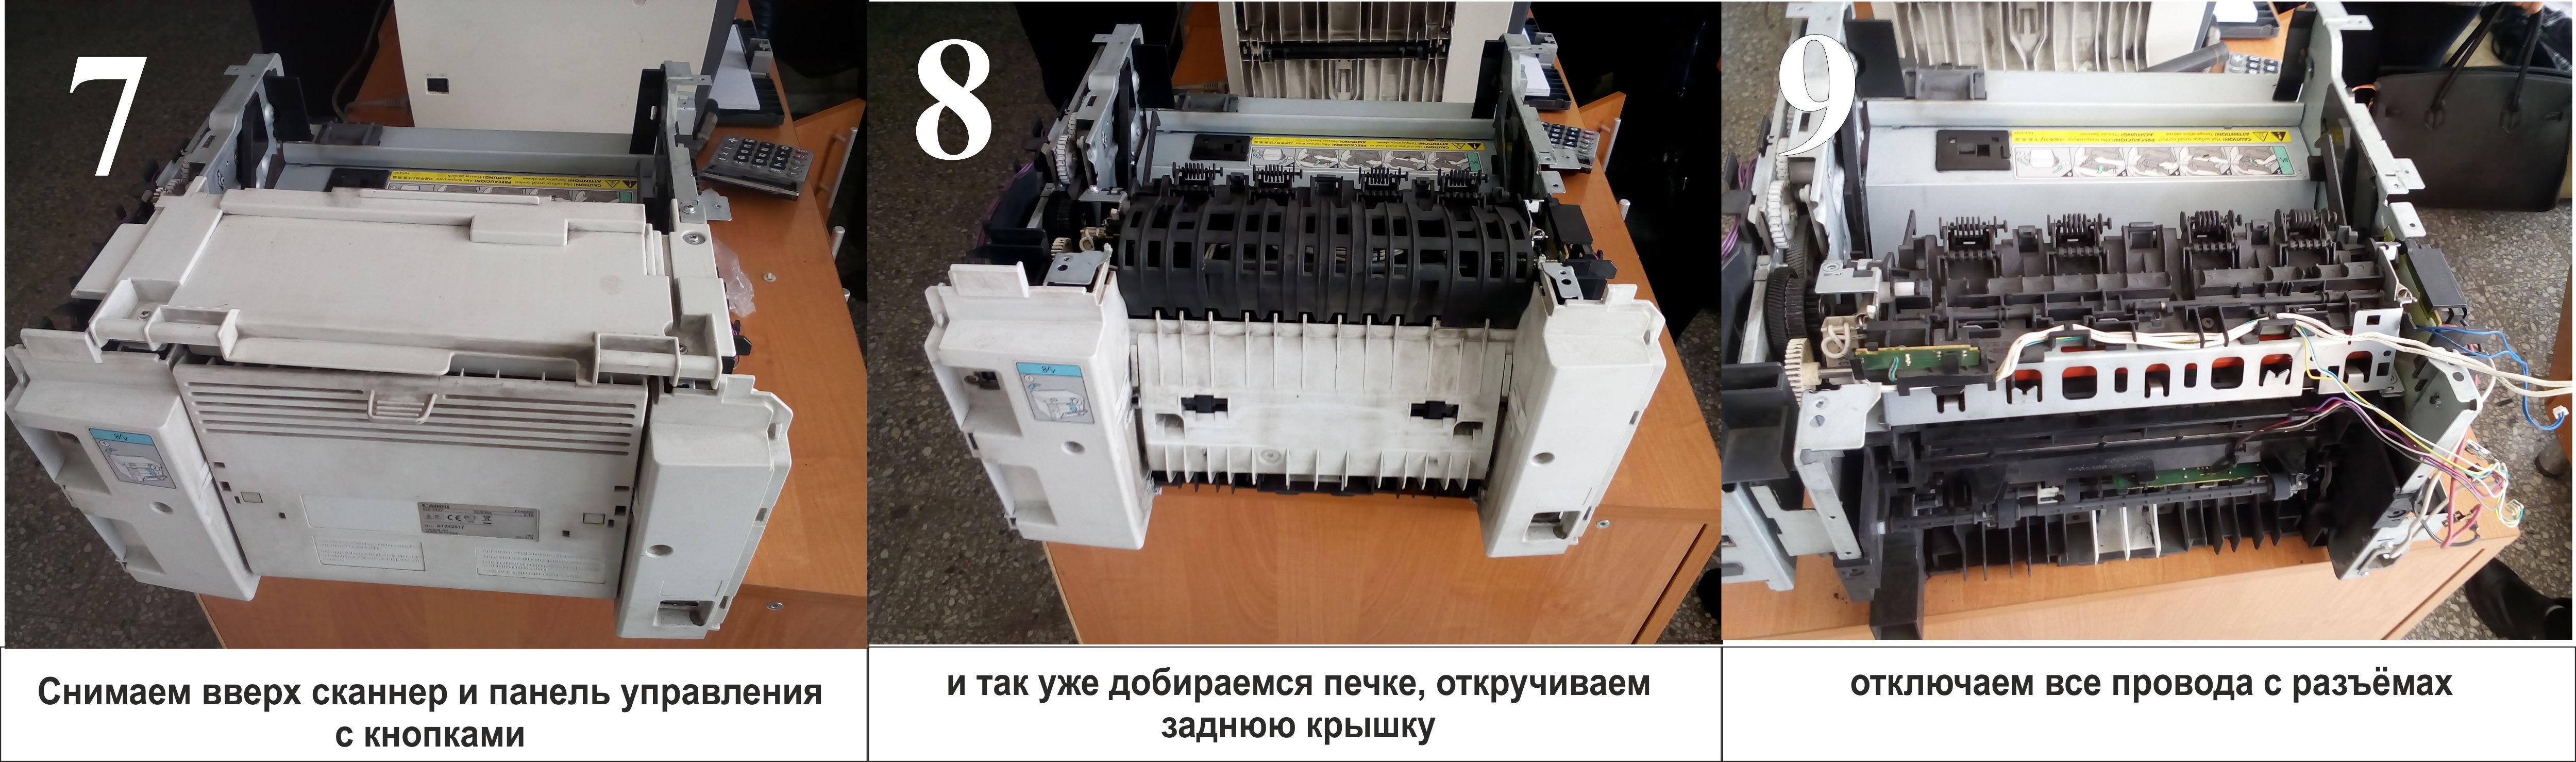 http://s2.uploads.ru/1cnYl.jpg